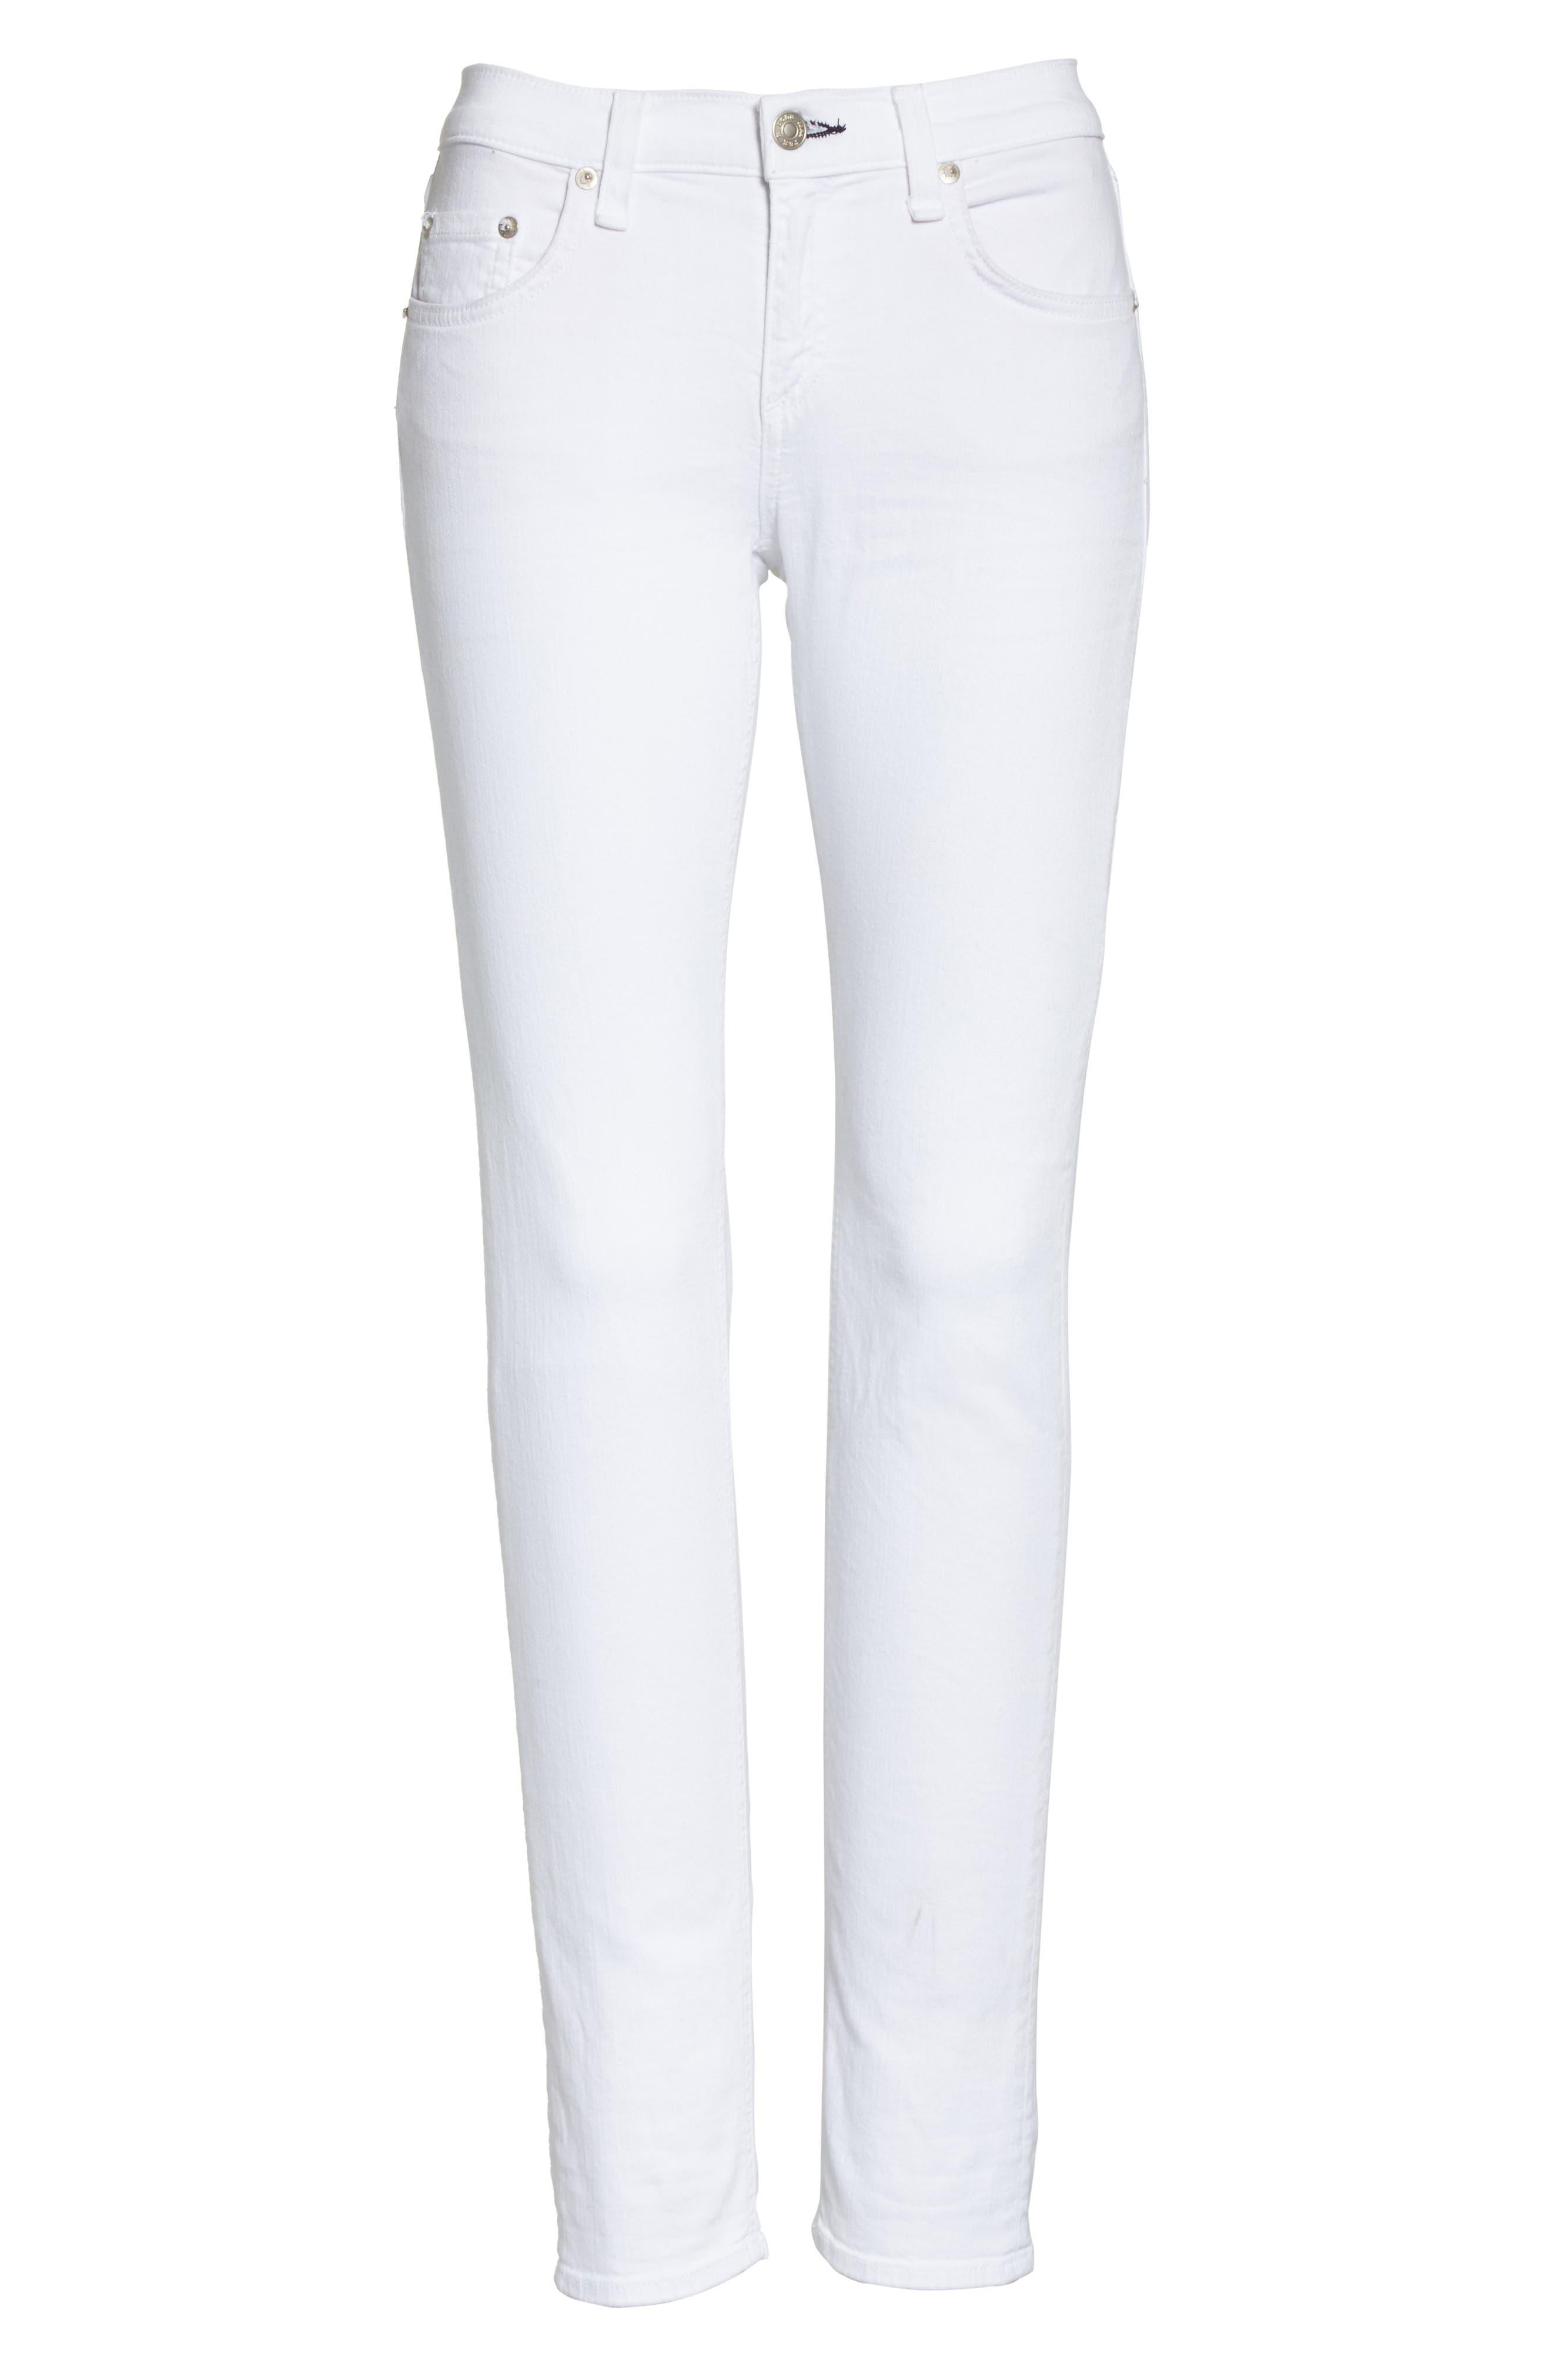 'The Dre' Skinny Jeans,                             Alternate thumbnail 8, color,                             BRIGHT WHITE